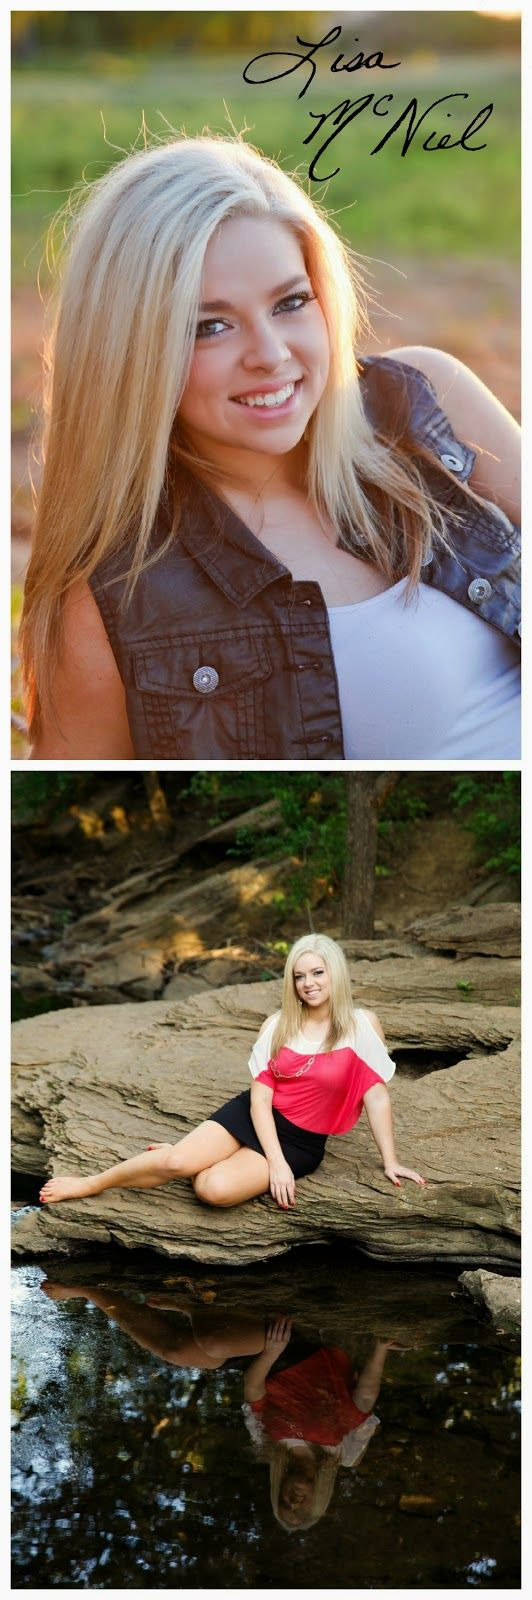 senior pictures, dancer, dance, senior portraits, senior photography, senior picture ideas for girls, North Texas Photographer